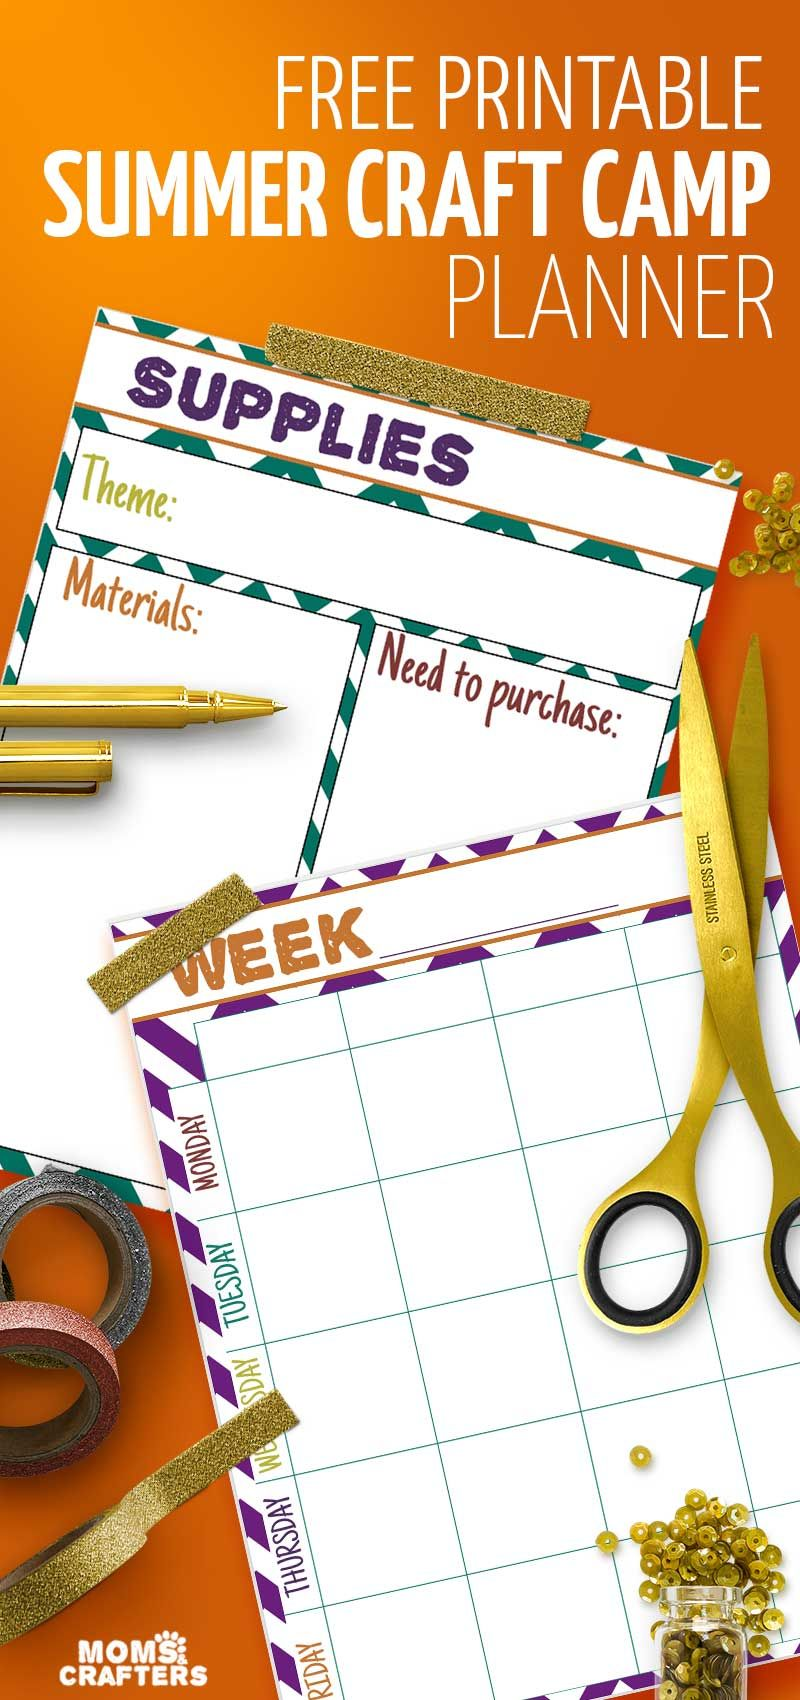 craft planner free printable calendar for craft camp at home moms rh pinterest com